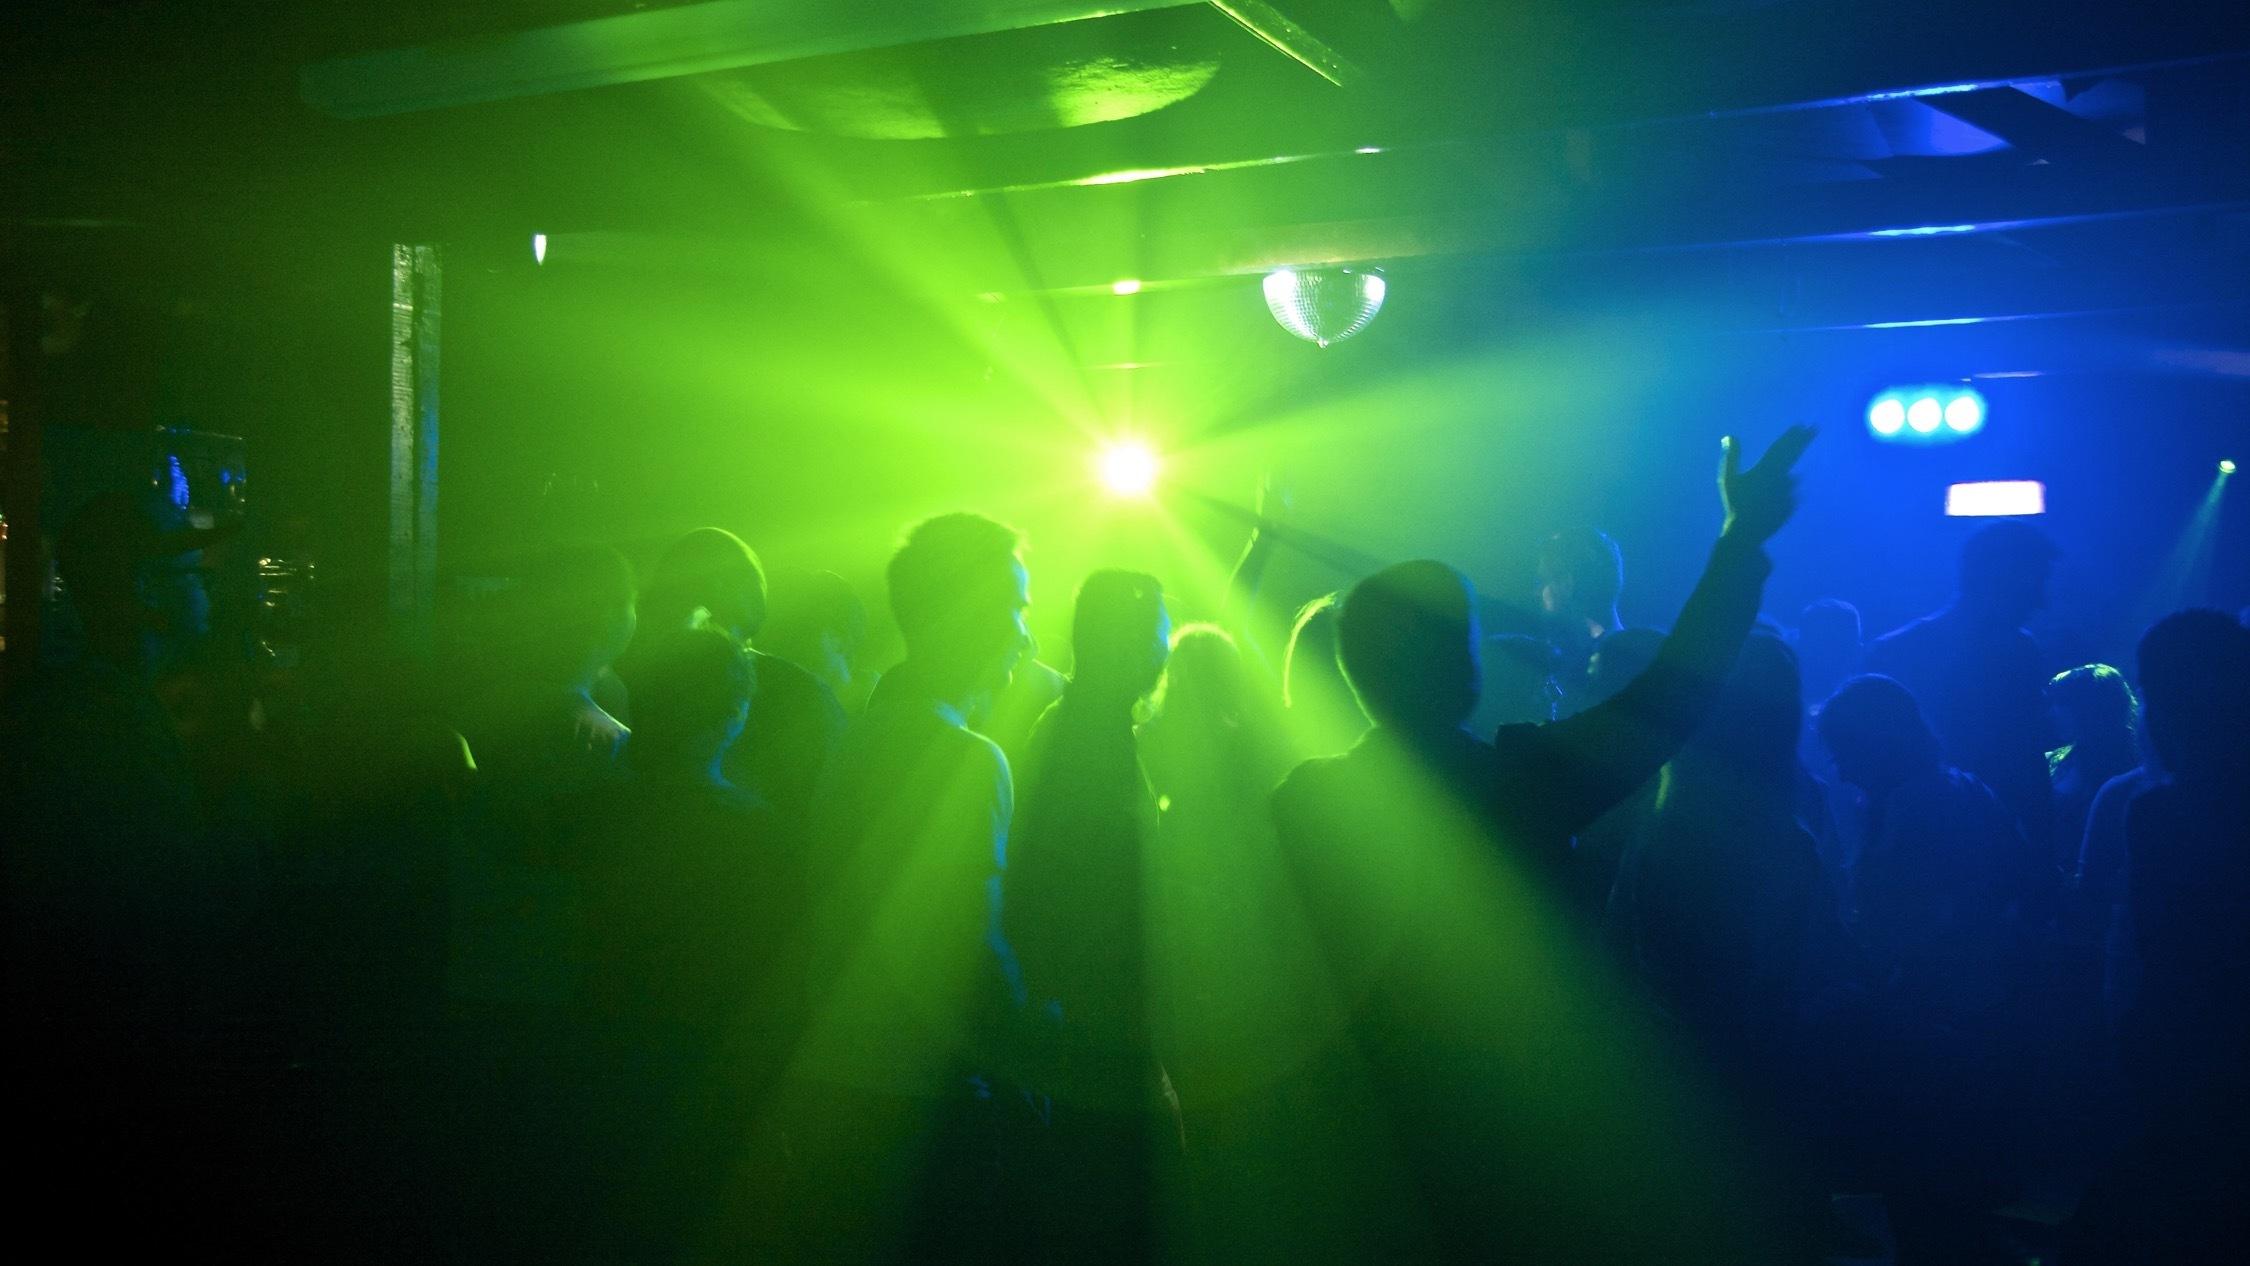 Generic Night Club